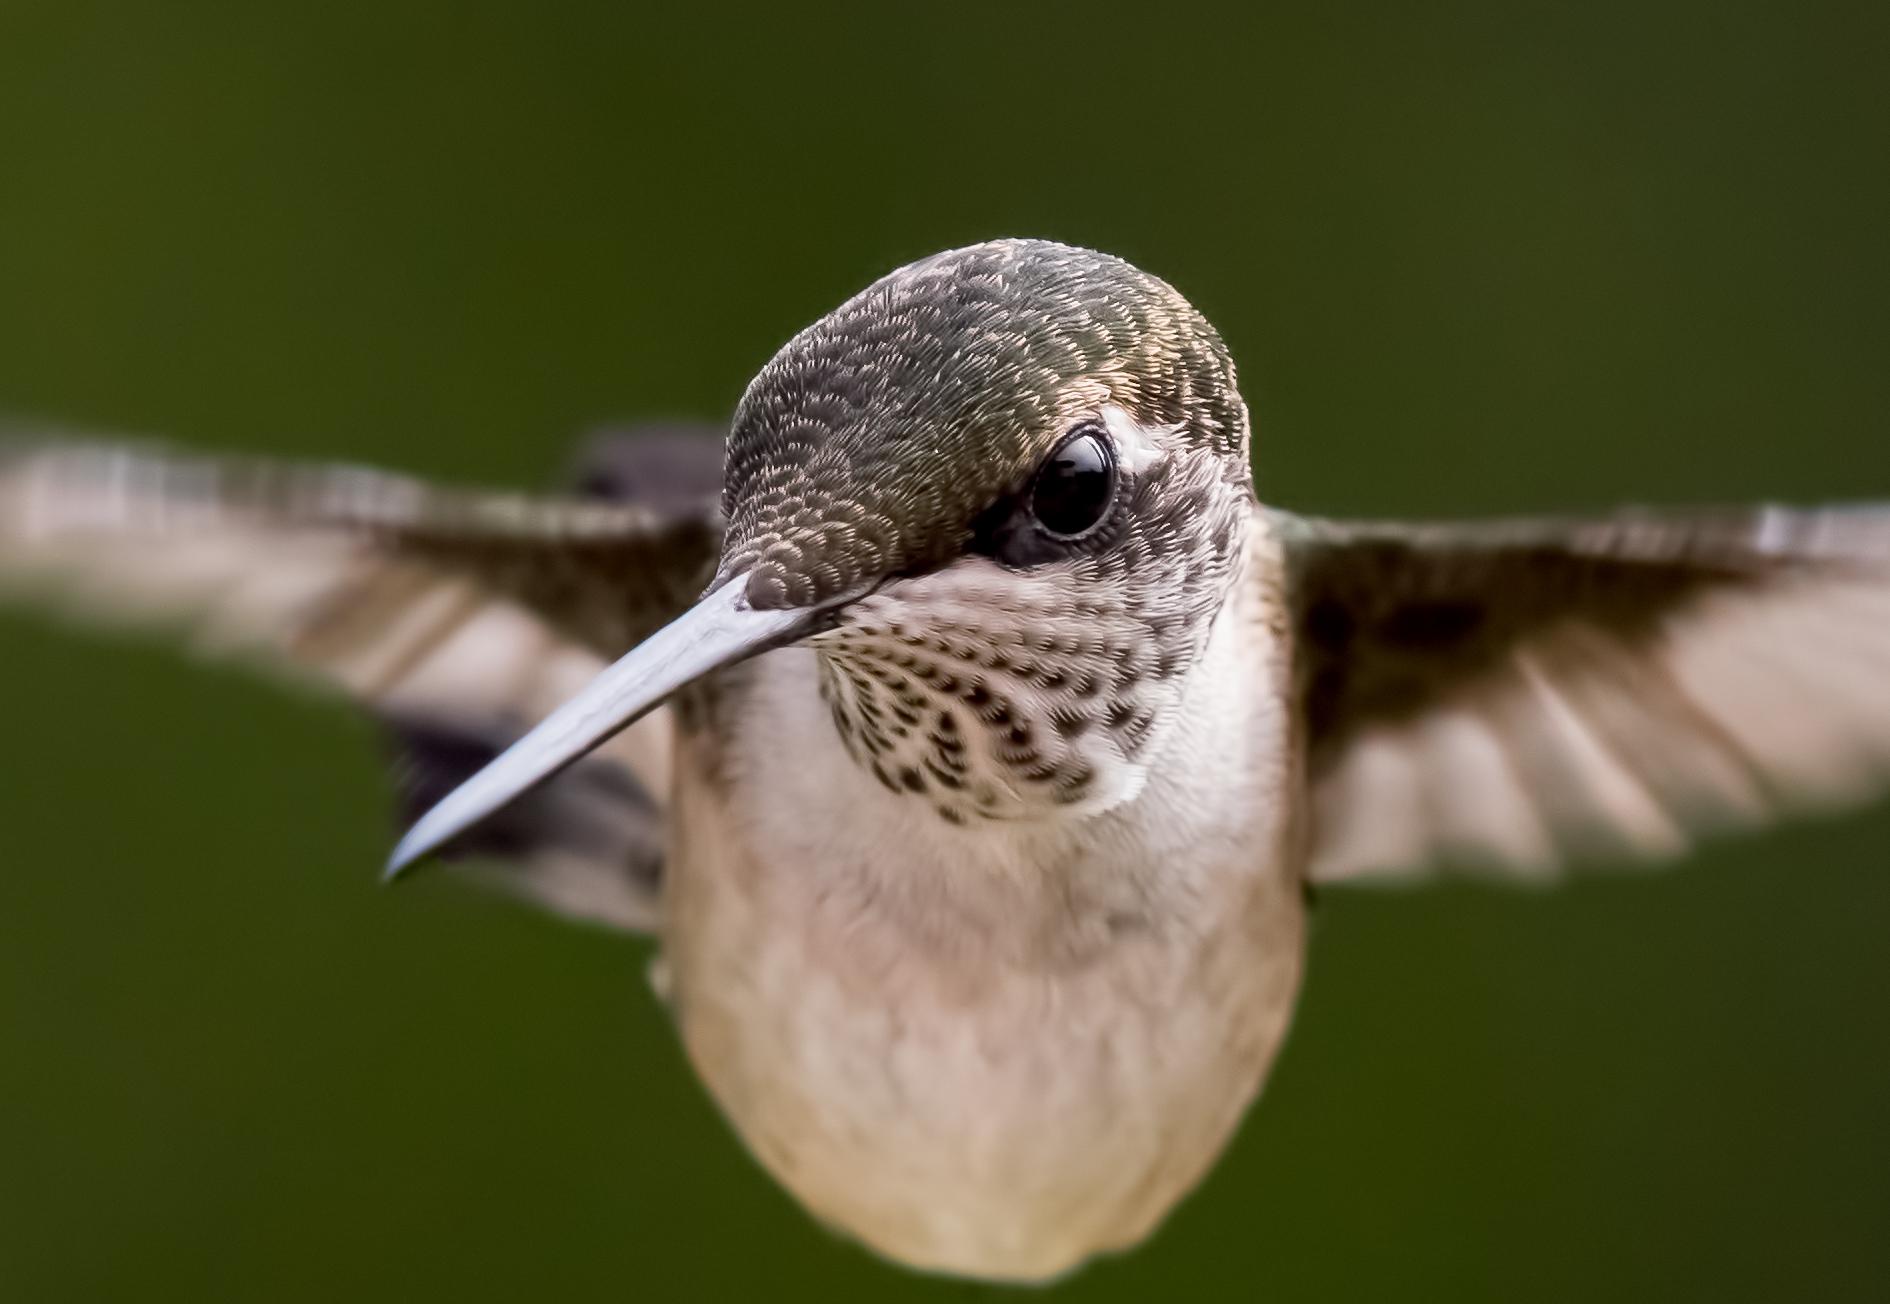 Potpourri: BirdSpotter Judges' Selection Winner  Potpourri: BirdSpotter Judges' Selection Winner Category8 JC RTHU DianneRoland